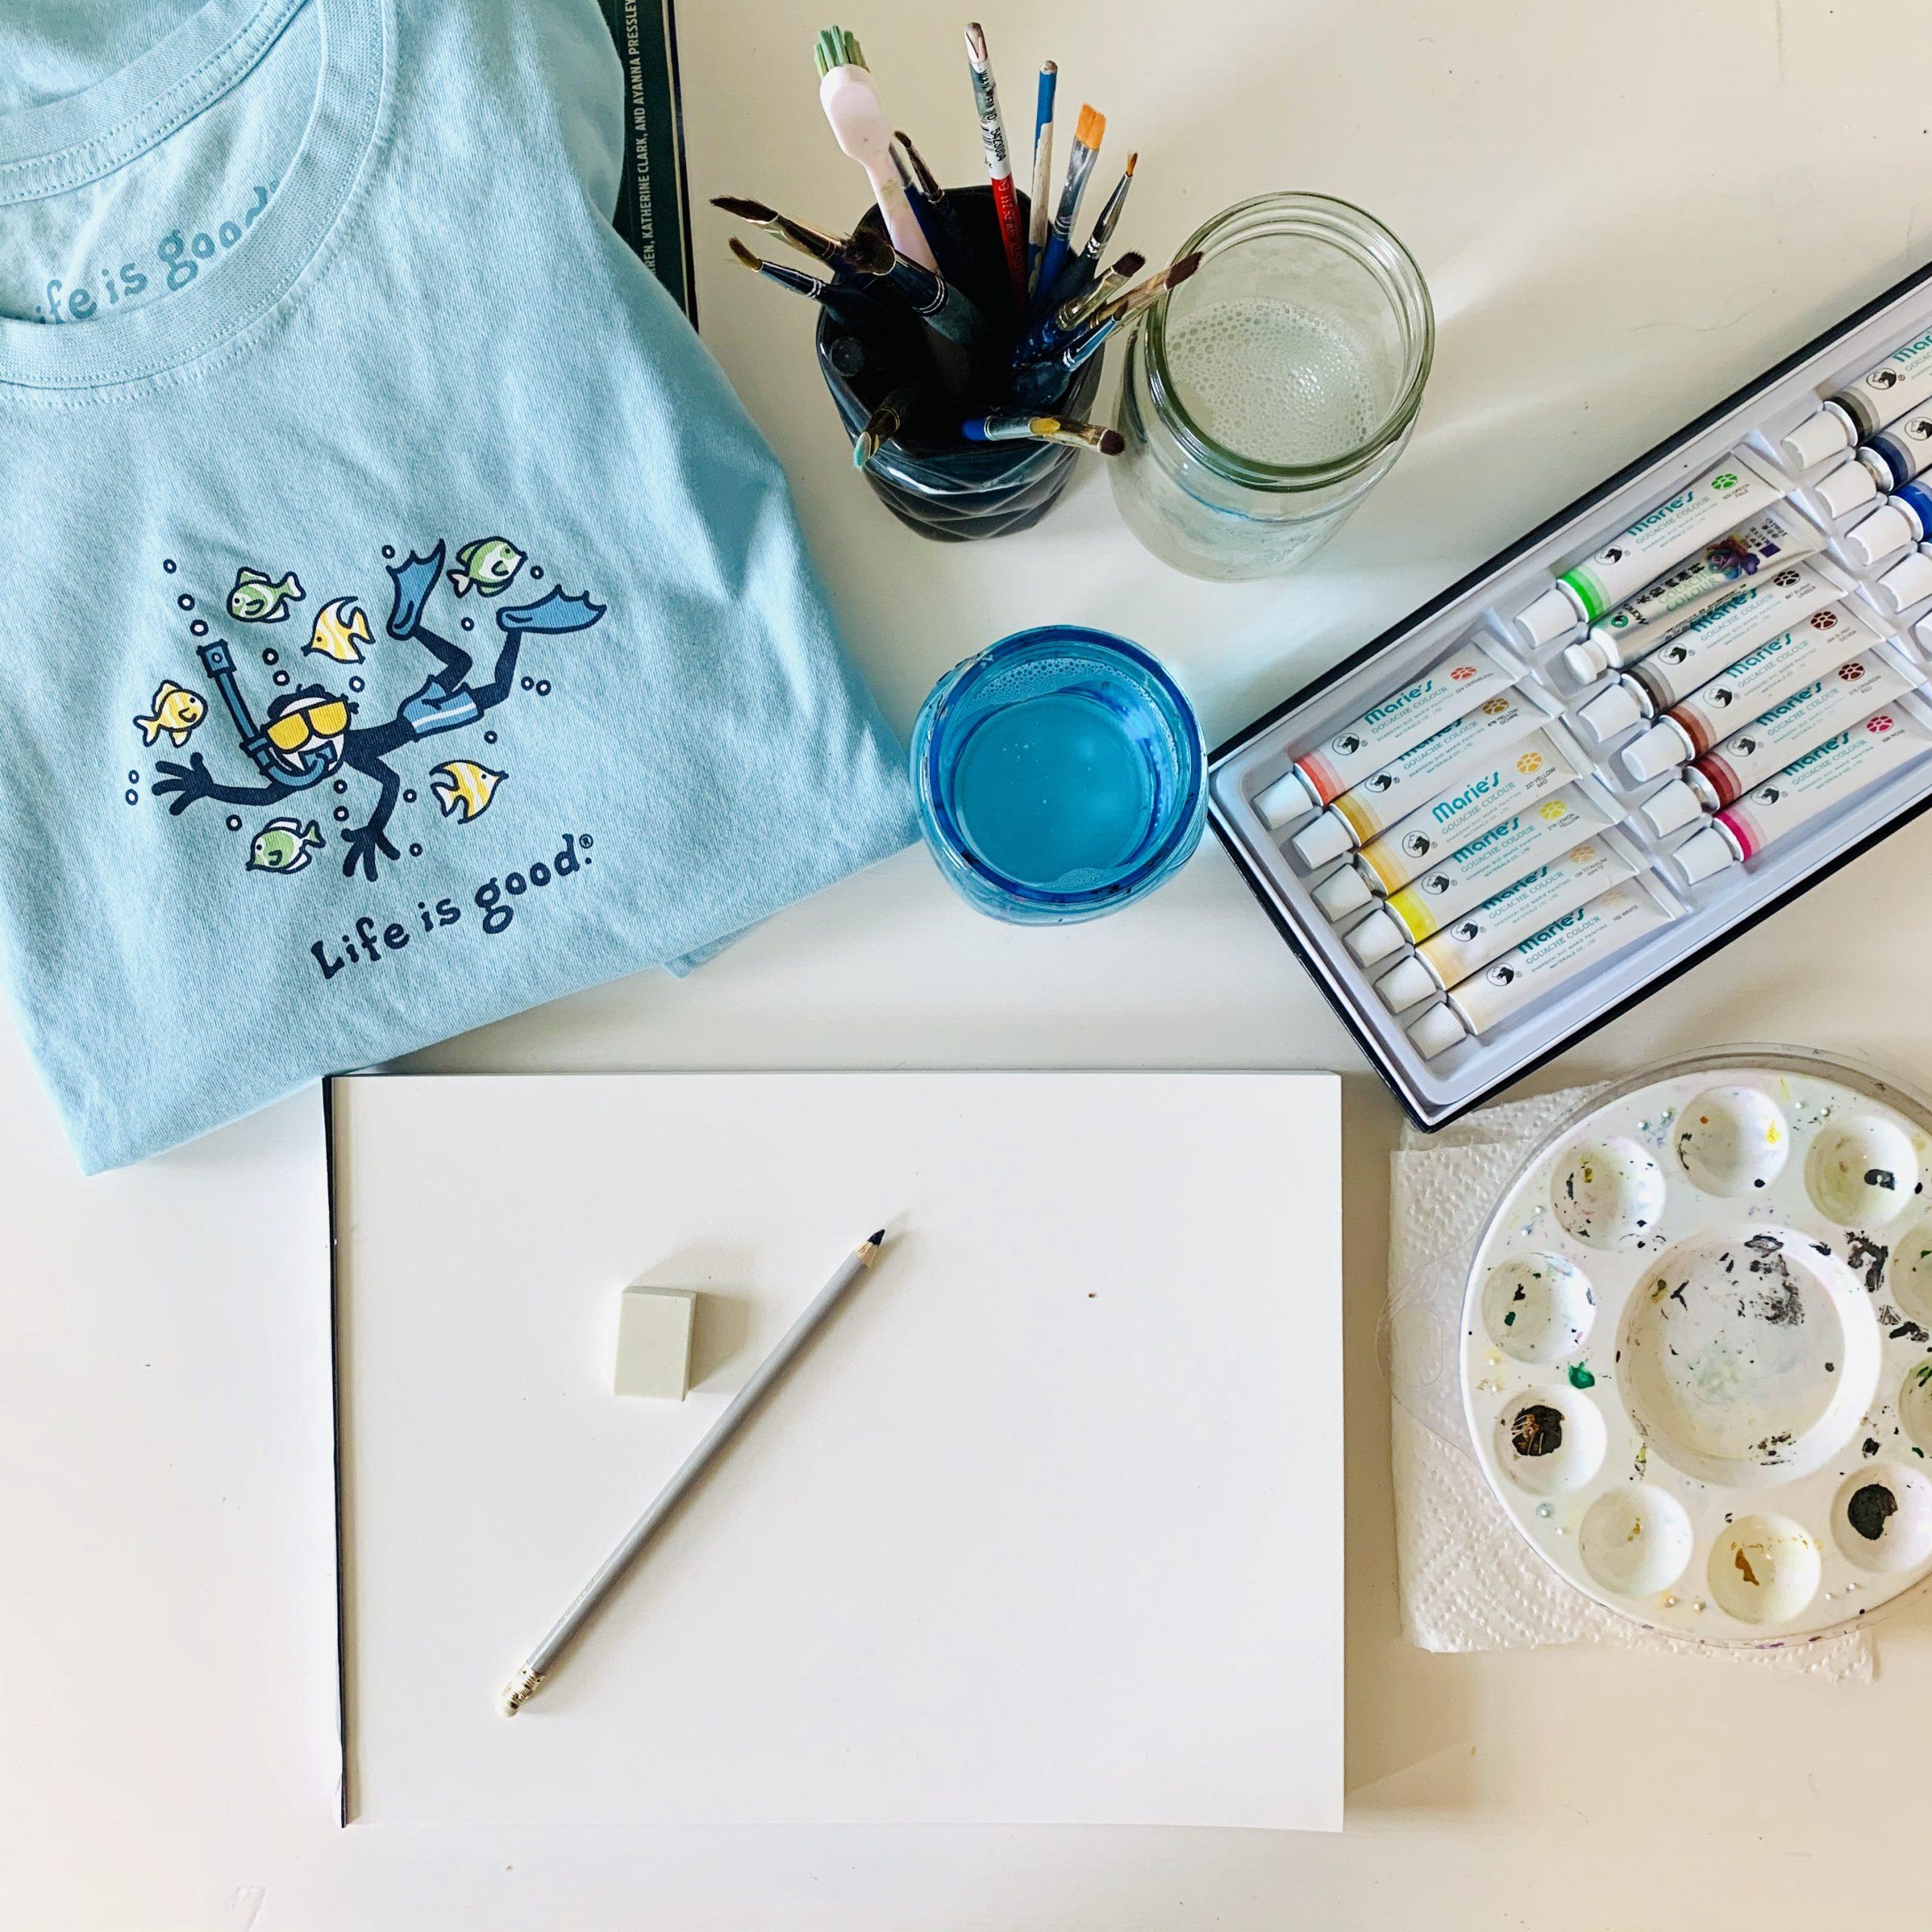 Watercolor Materials